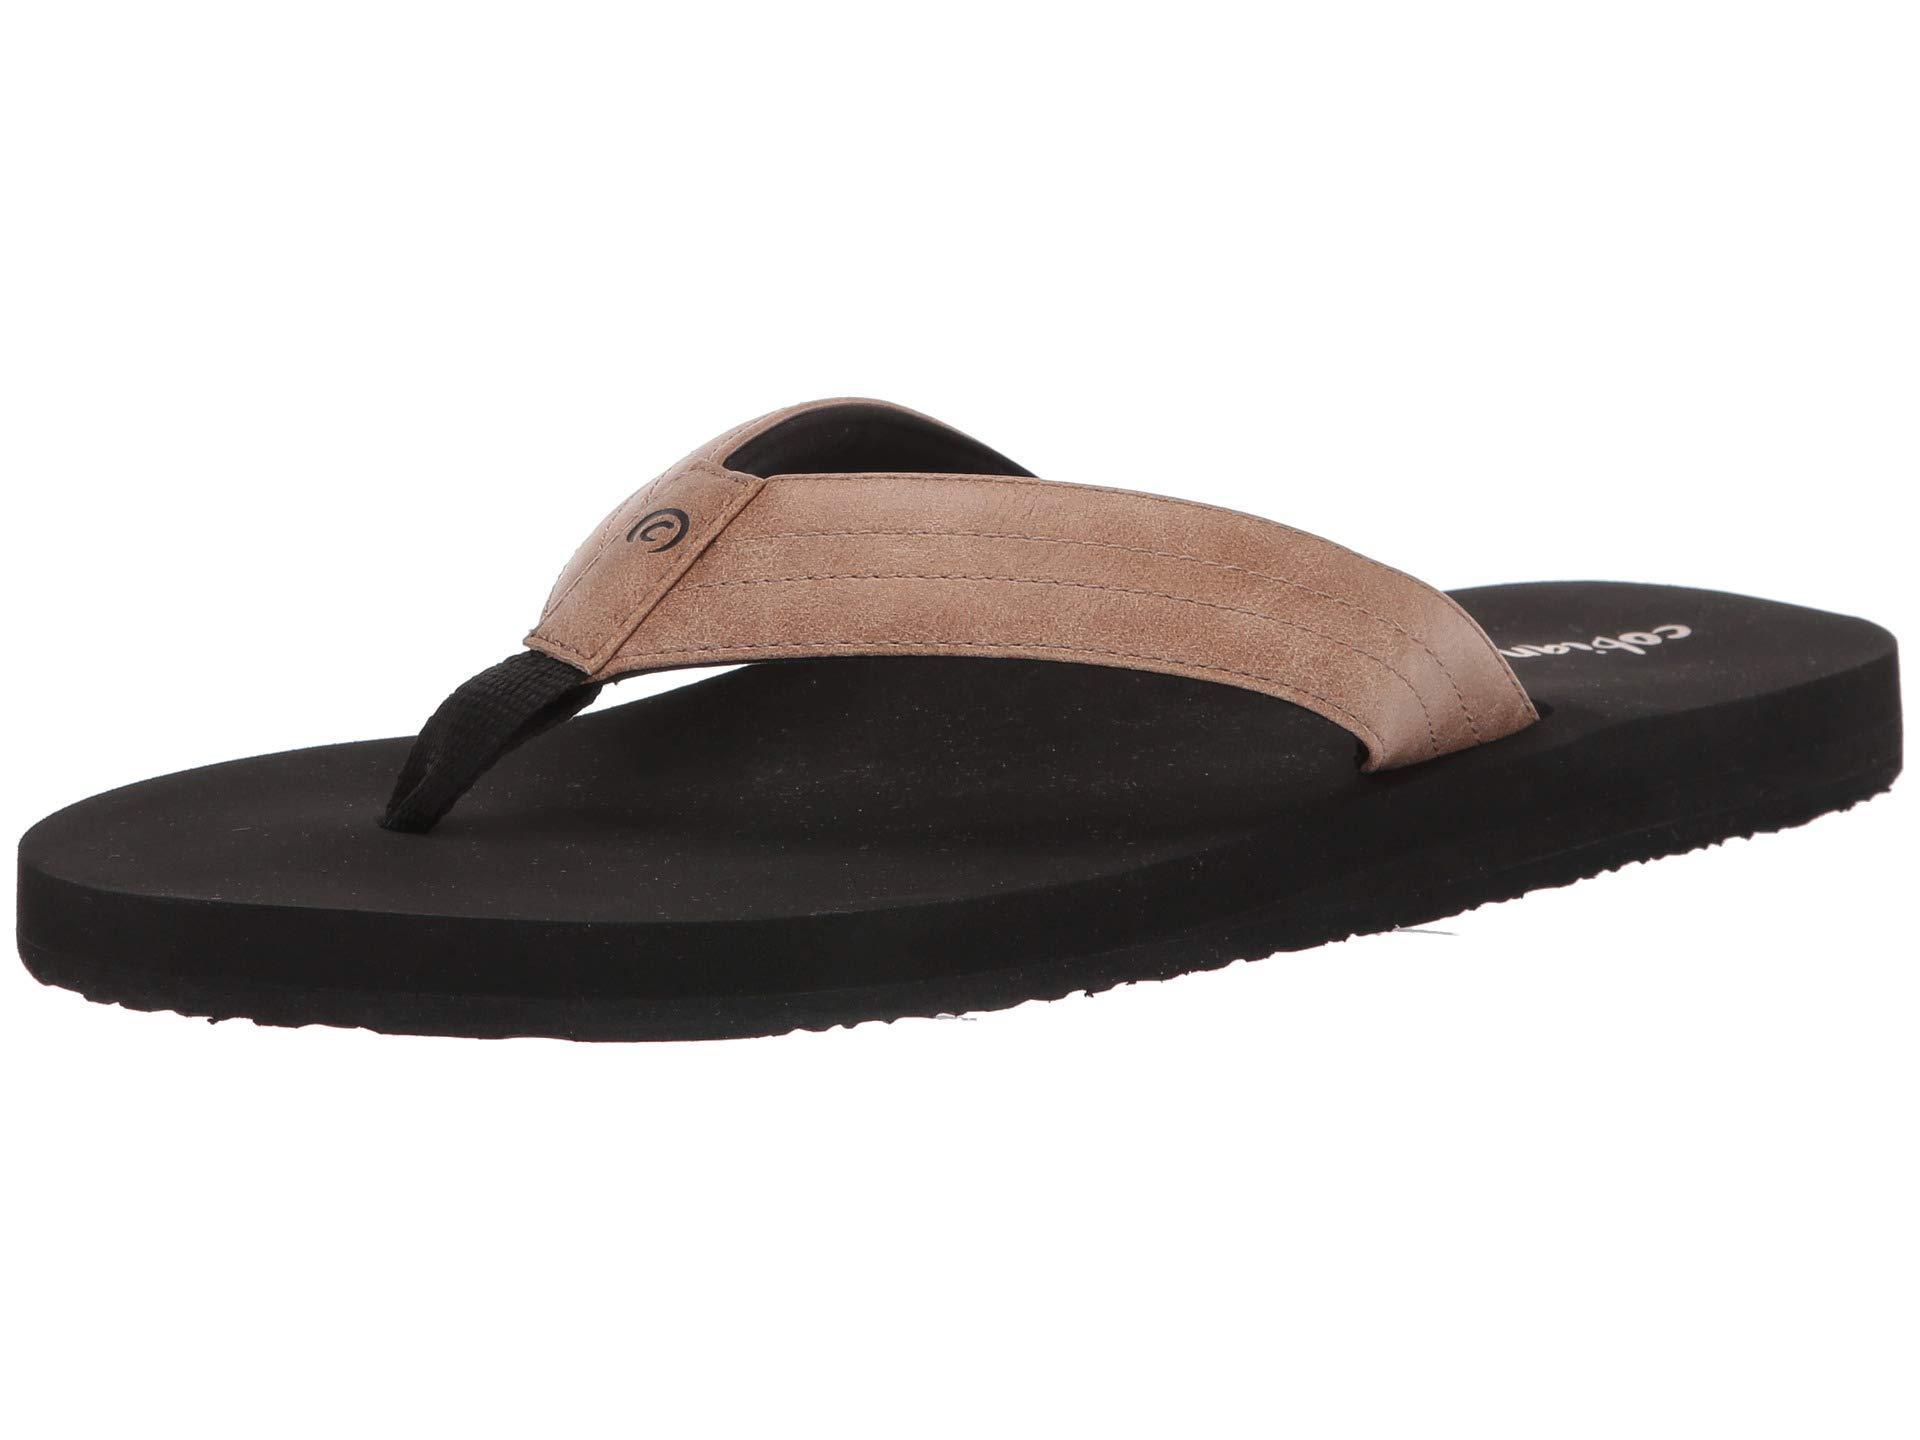 dcbb801bb Lyst - Cobian Costa (cement) Men s Sandals in Black for Men